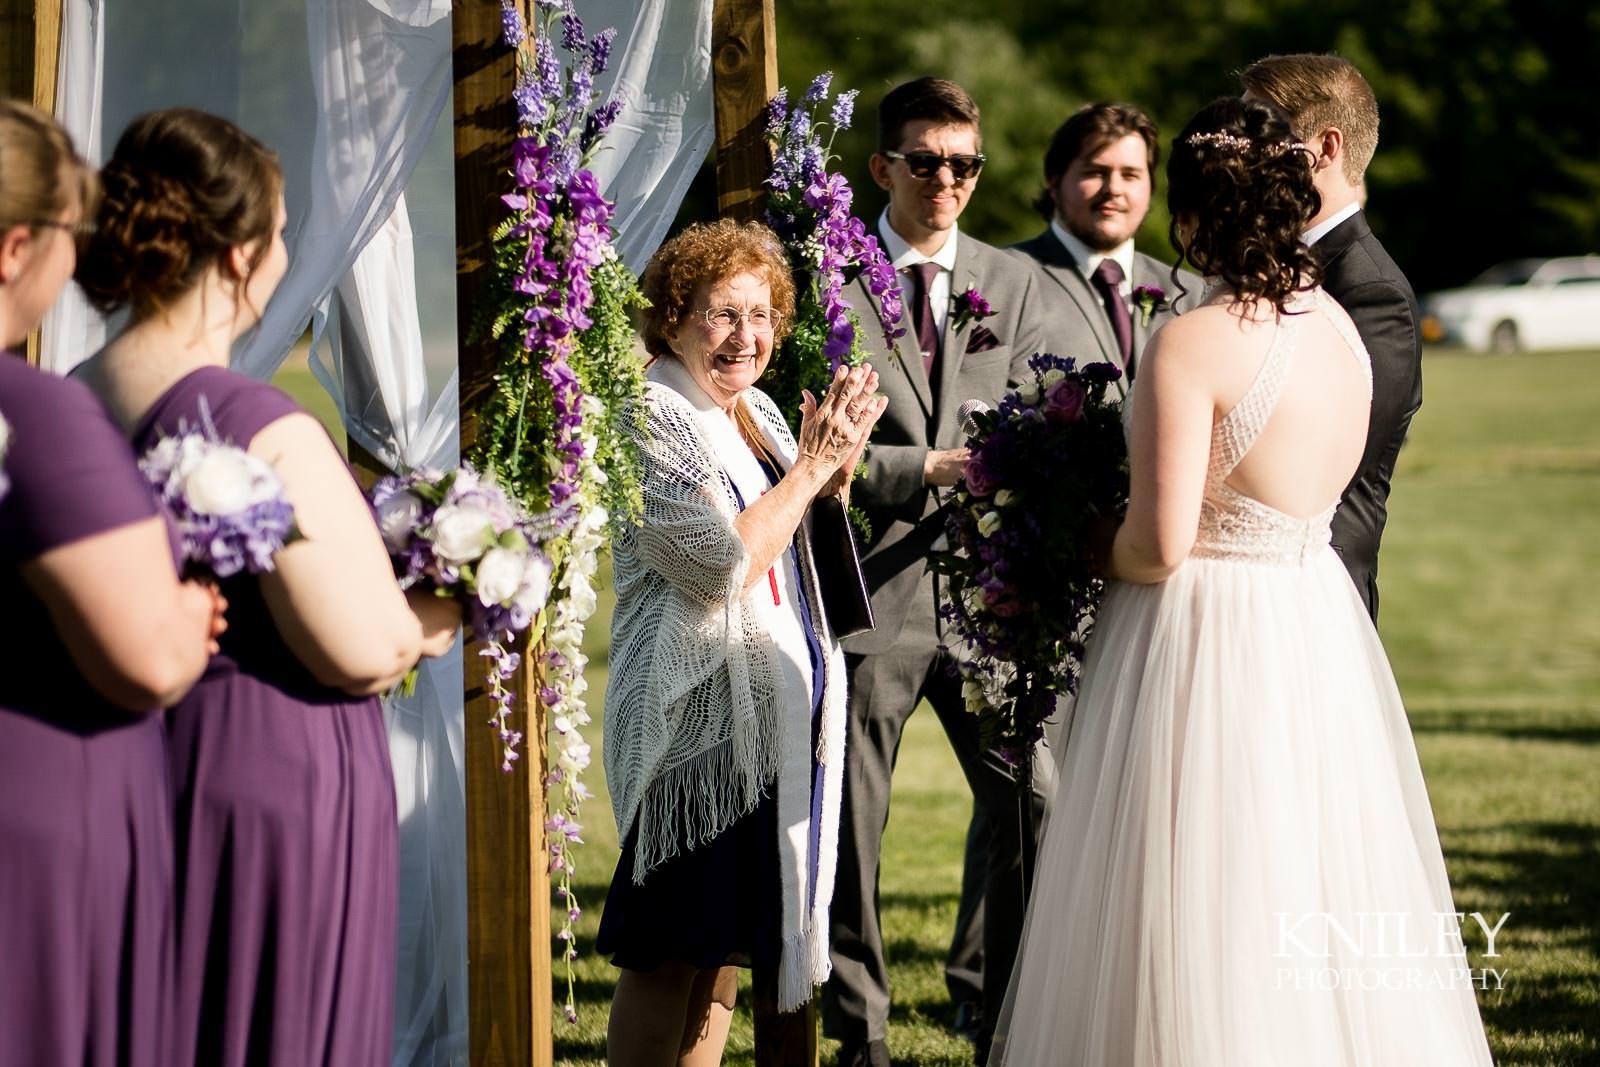 27-Redmond-House-Dansville-NY-Wedding-Photography.jpg